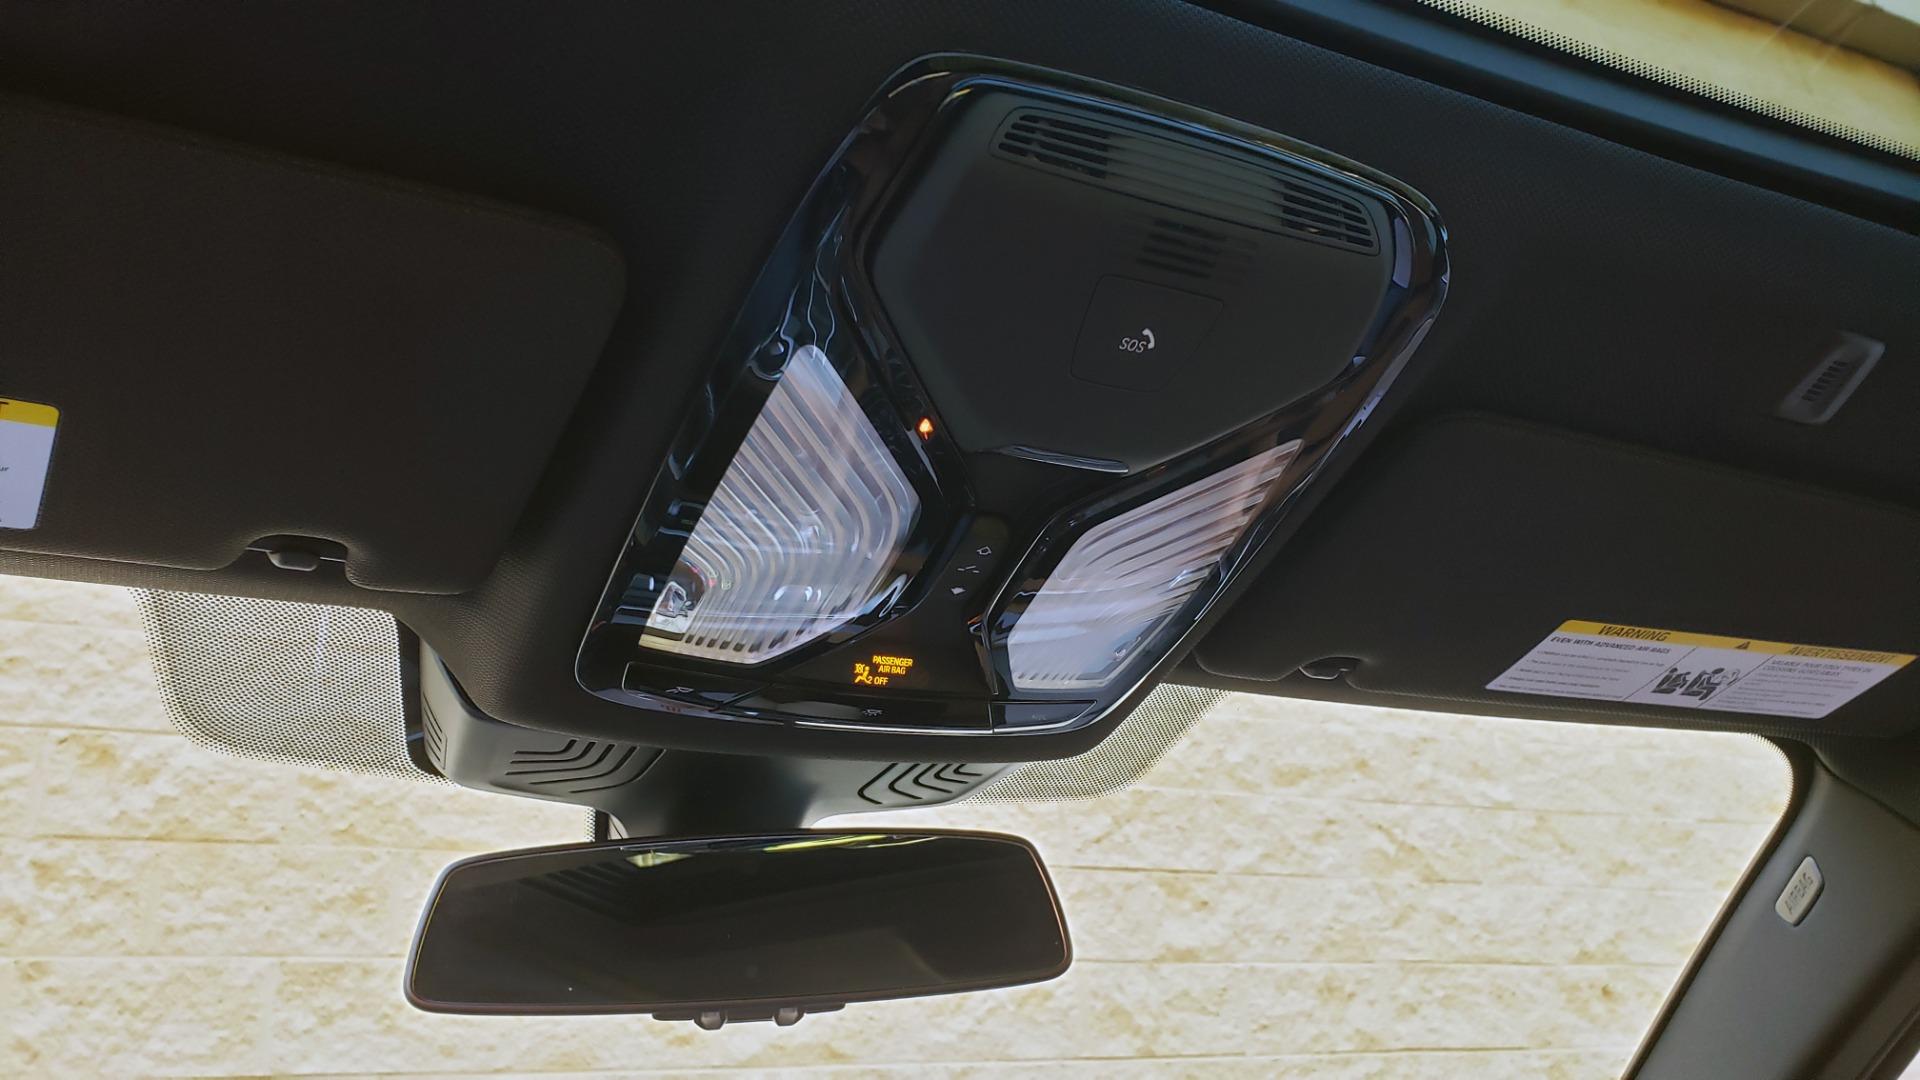 Used 2018 BMW 5 SERIES 540I M-SPORT / DRVR ASST / EXEC PKG / NAV / SUNROOF / HUD / REARVIEW for sale Sold at Formula Imports in Charlotte NC 28227 57